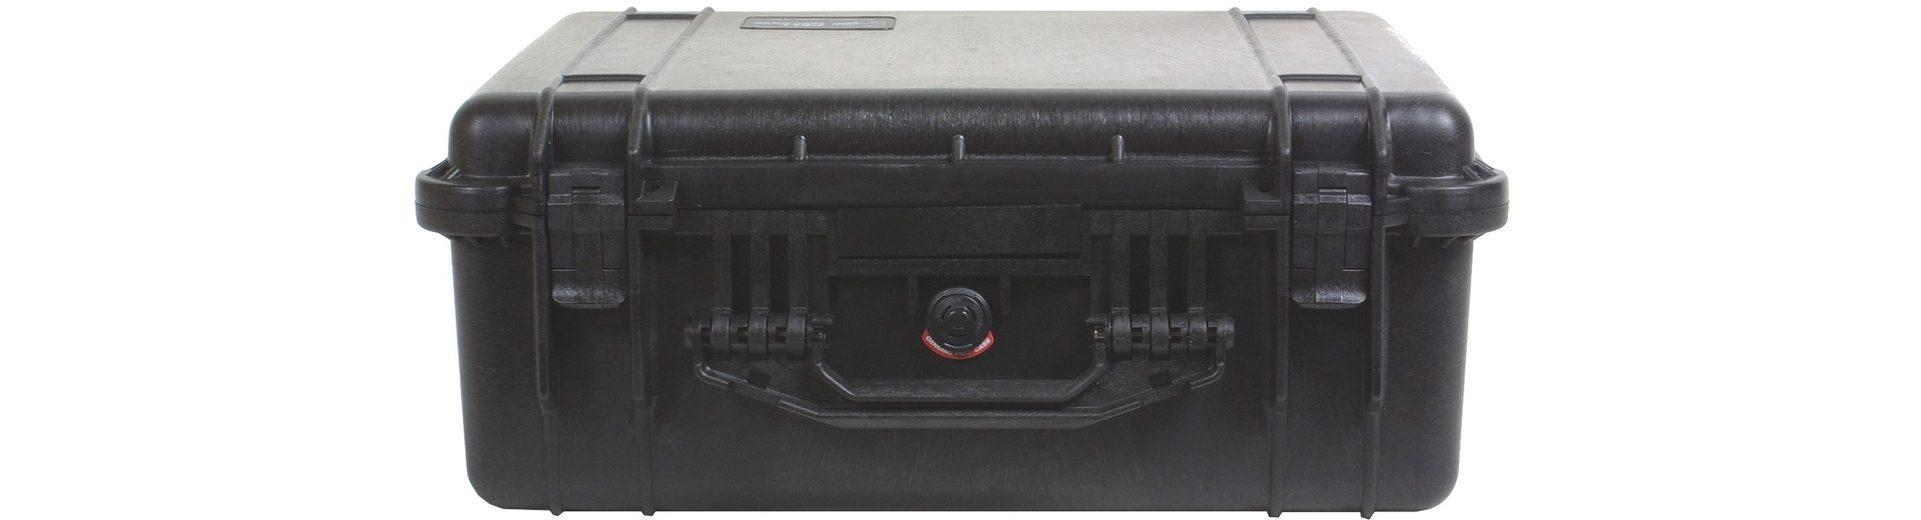 Peli Campingtruhe & -Kiste »box 1550 ohne Schaumeinsatz«